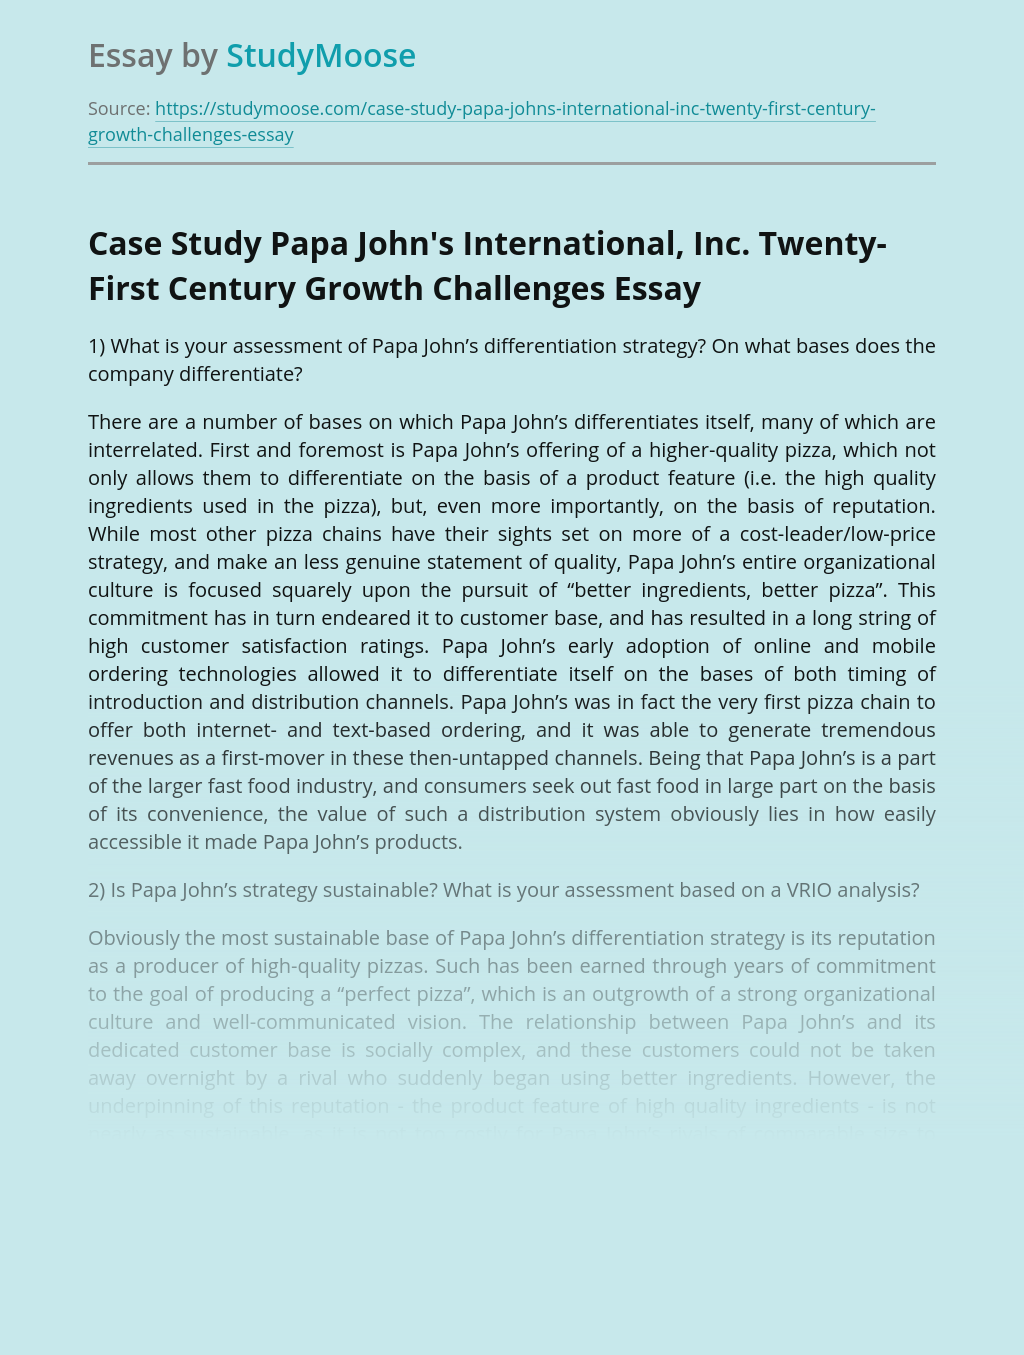 Case Study Papa John's International, Inc. Twenty-First Century Growth Challenges